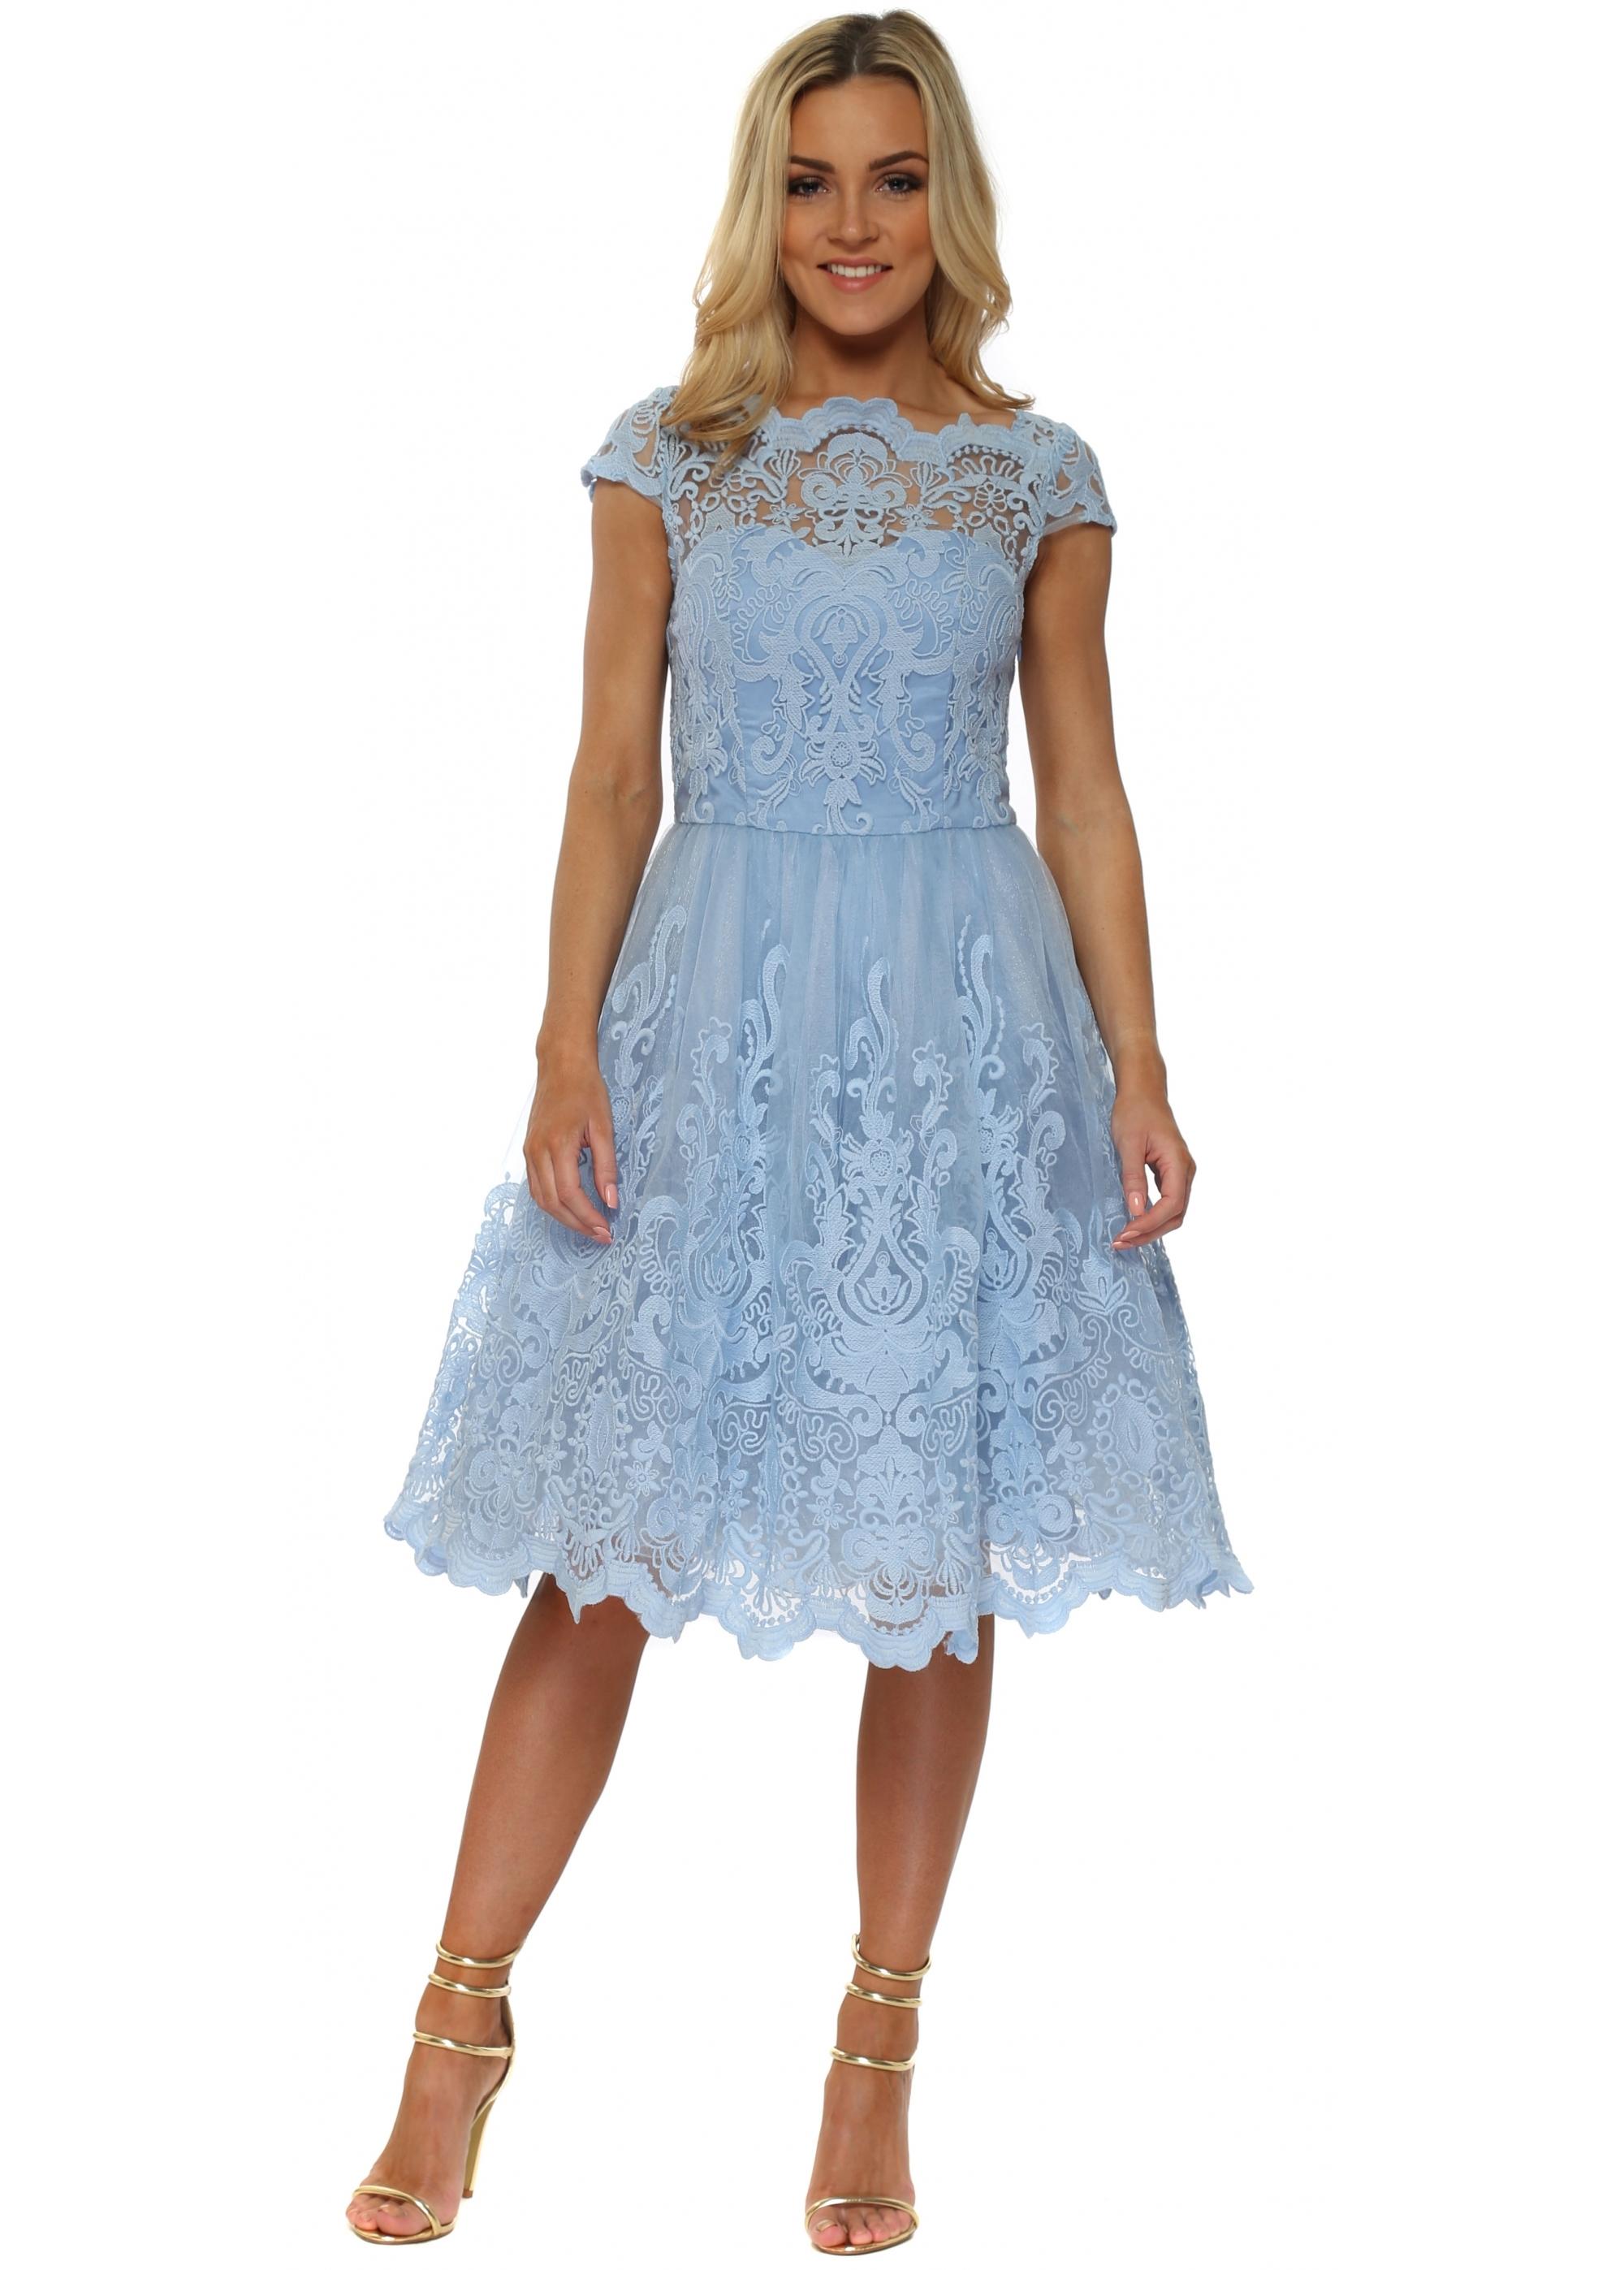 Chi Chi Rhiannon Dress Blue Baroque Lace Tea Dress